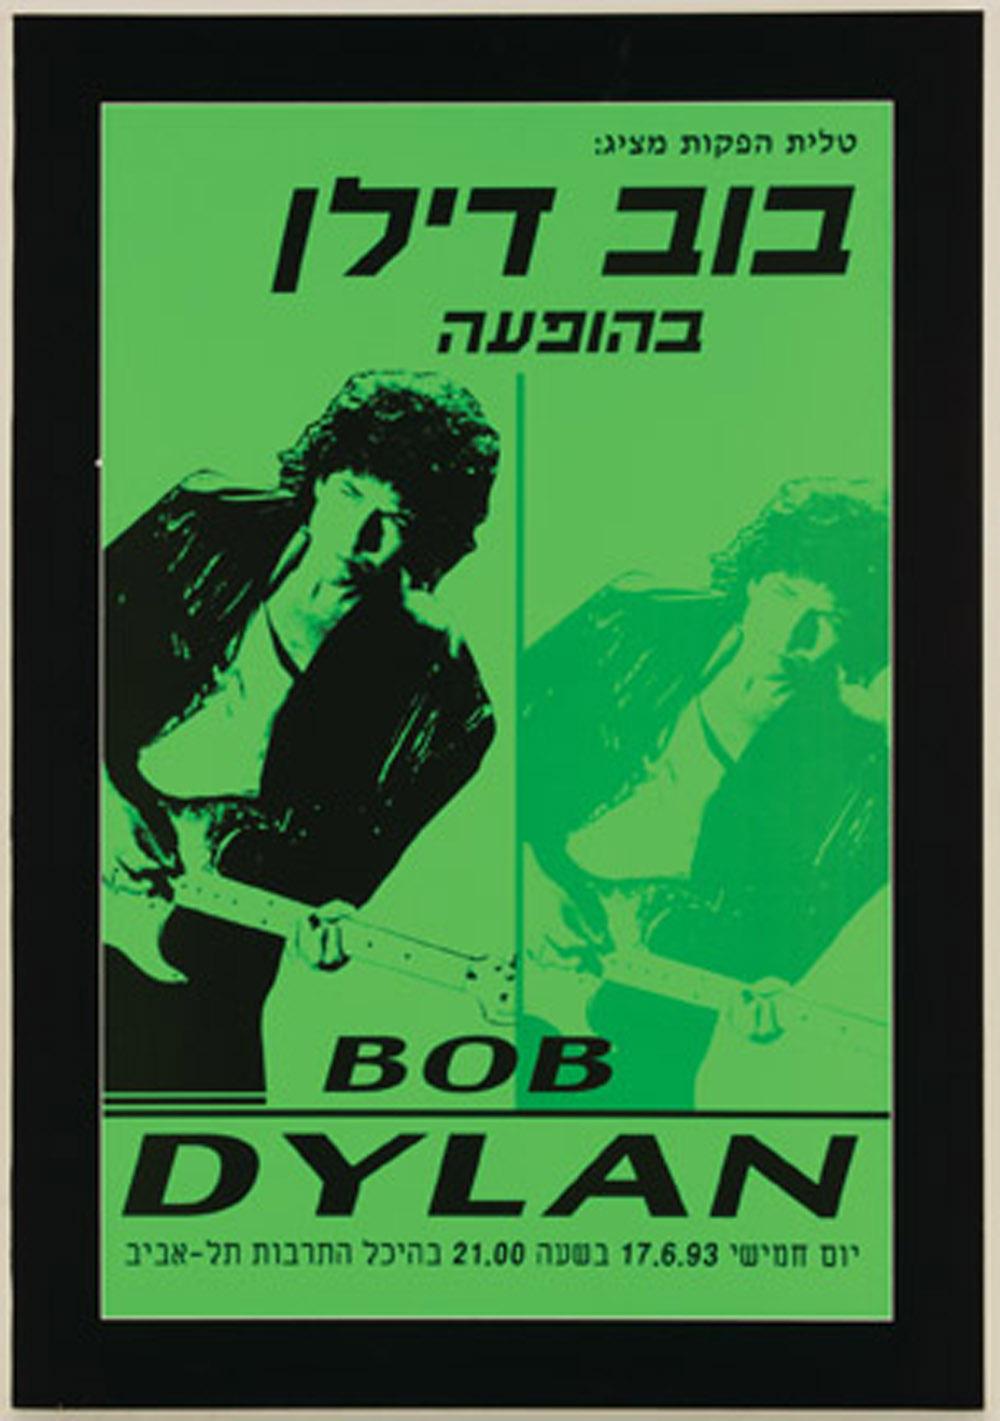 Httpwww Overlordsofchaos Comhtmlorigin Of The Word Jew Html: Bob Dylan Original Israeli Original Poster